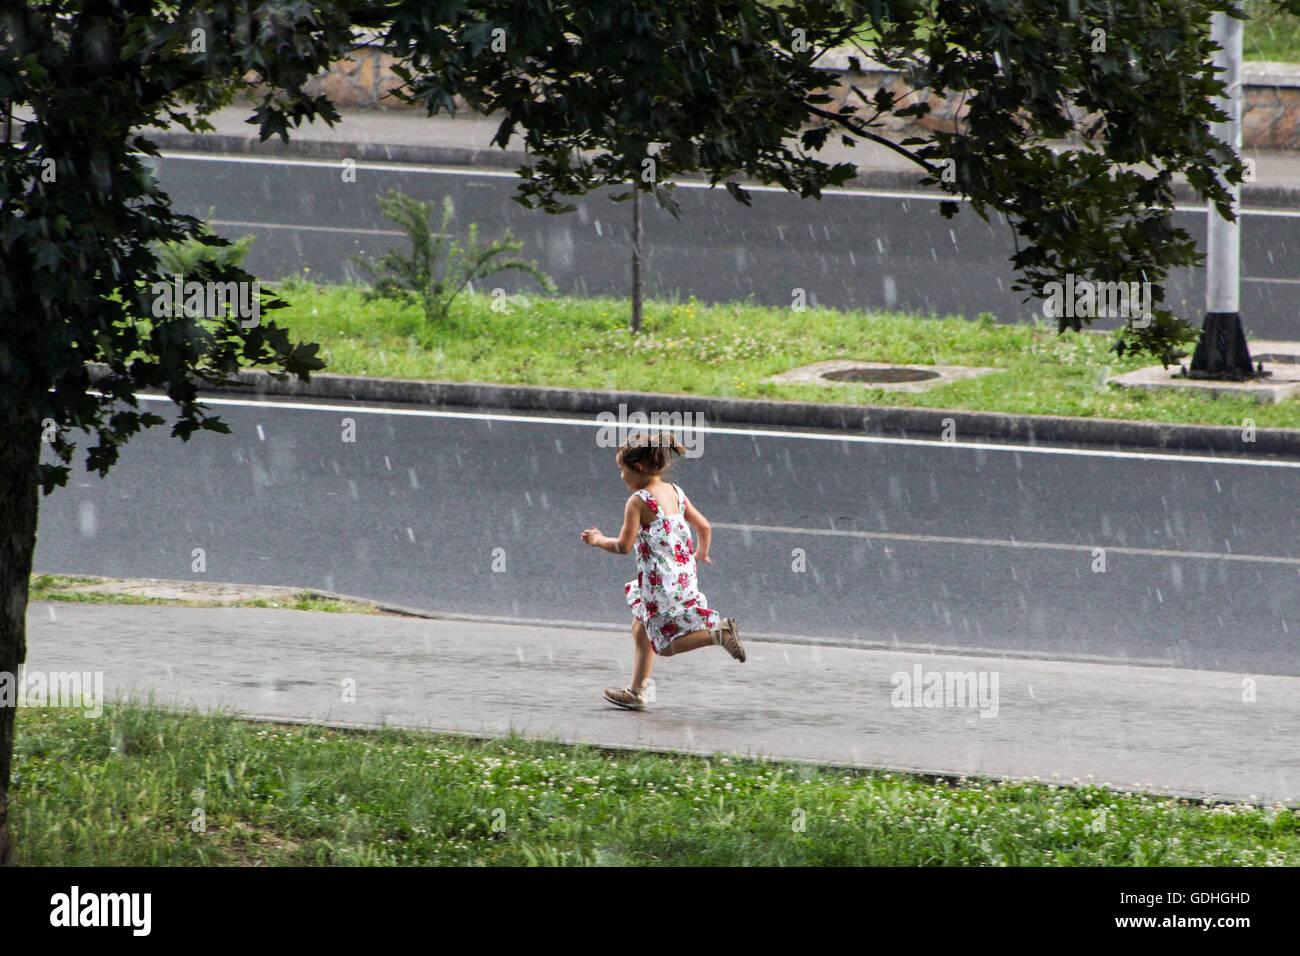 Girl Running Down Street Stockfotos & Girl Running Down Street ...